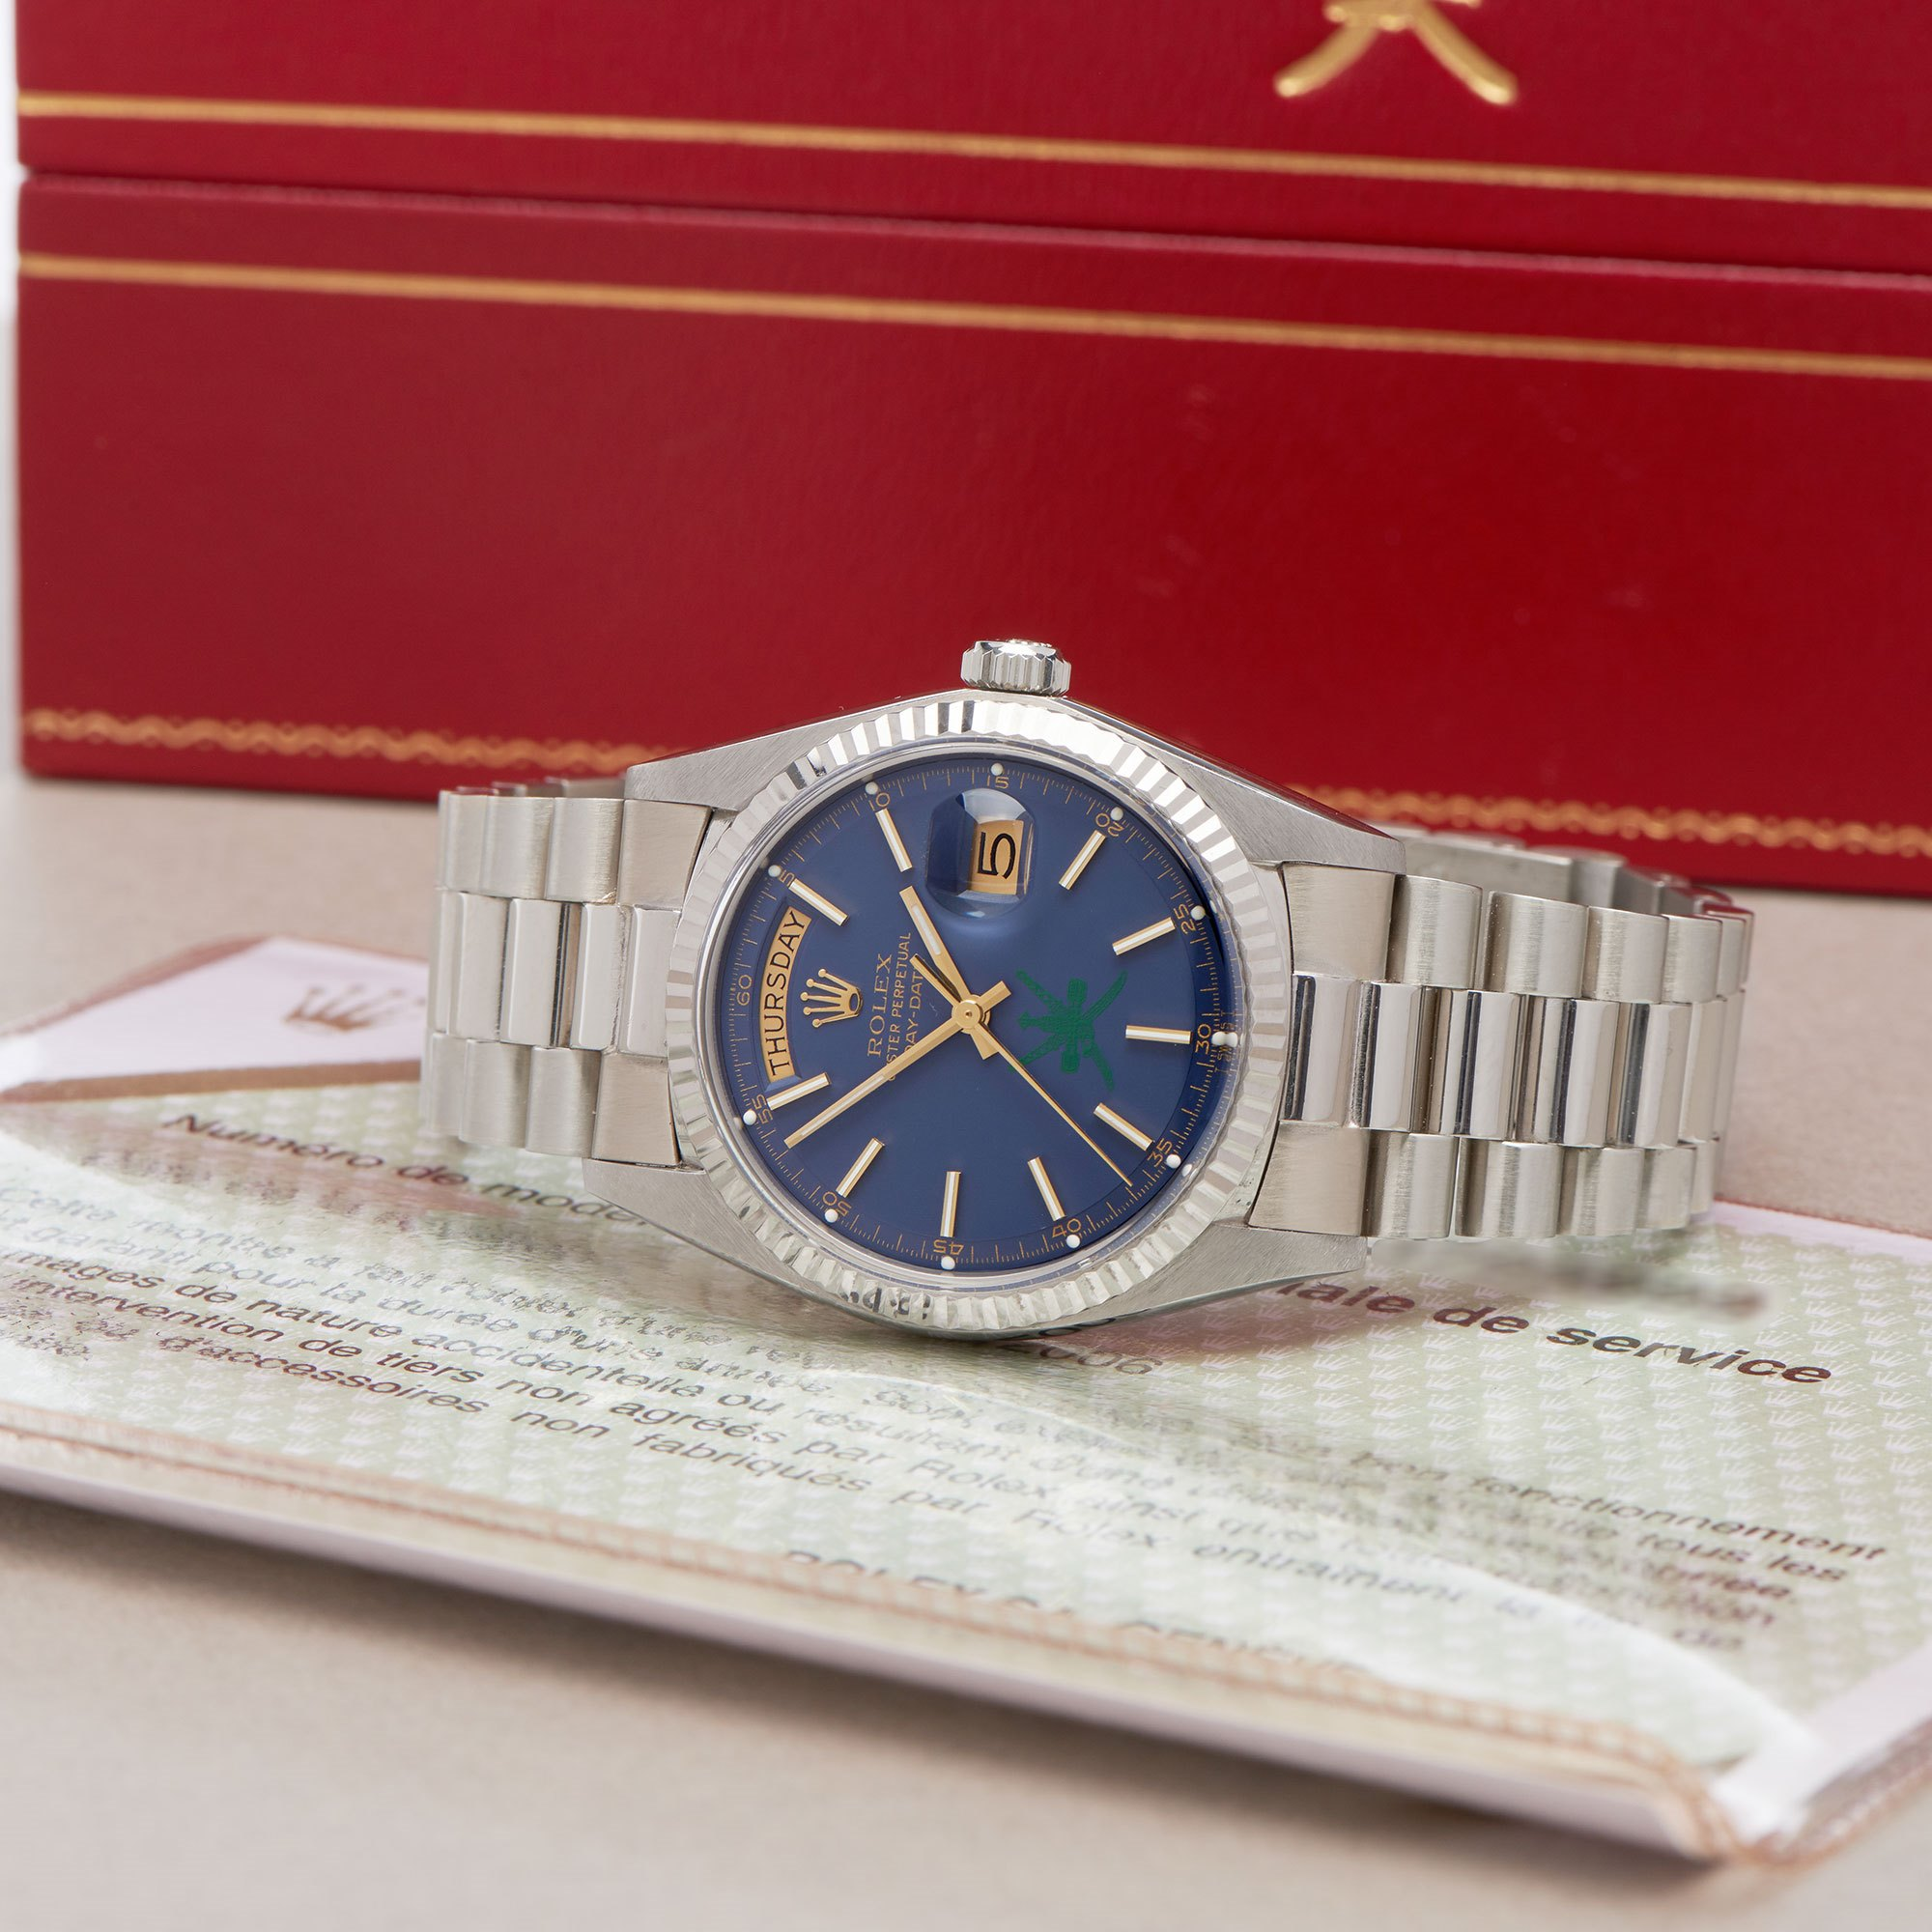 Rolex Day-Date 36 'Khanjar' Dial 18K White Gold - 1803/9 Wit Goud 1803/9